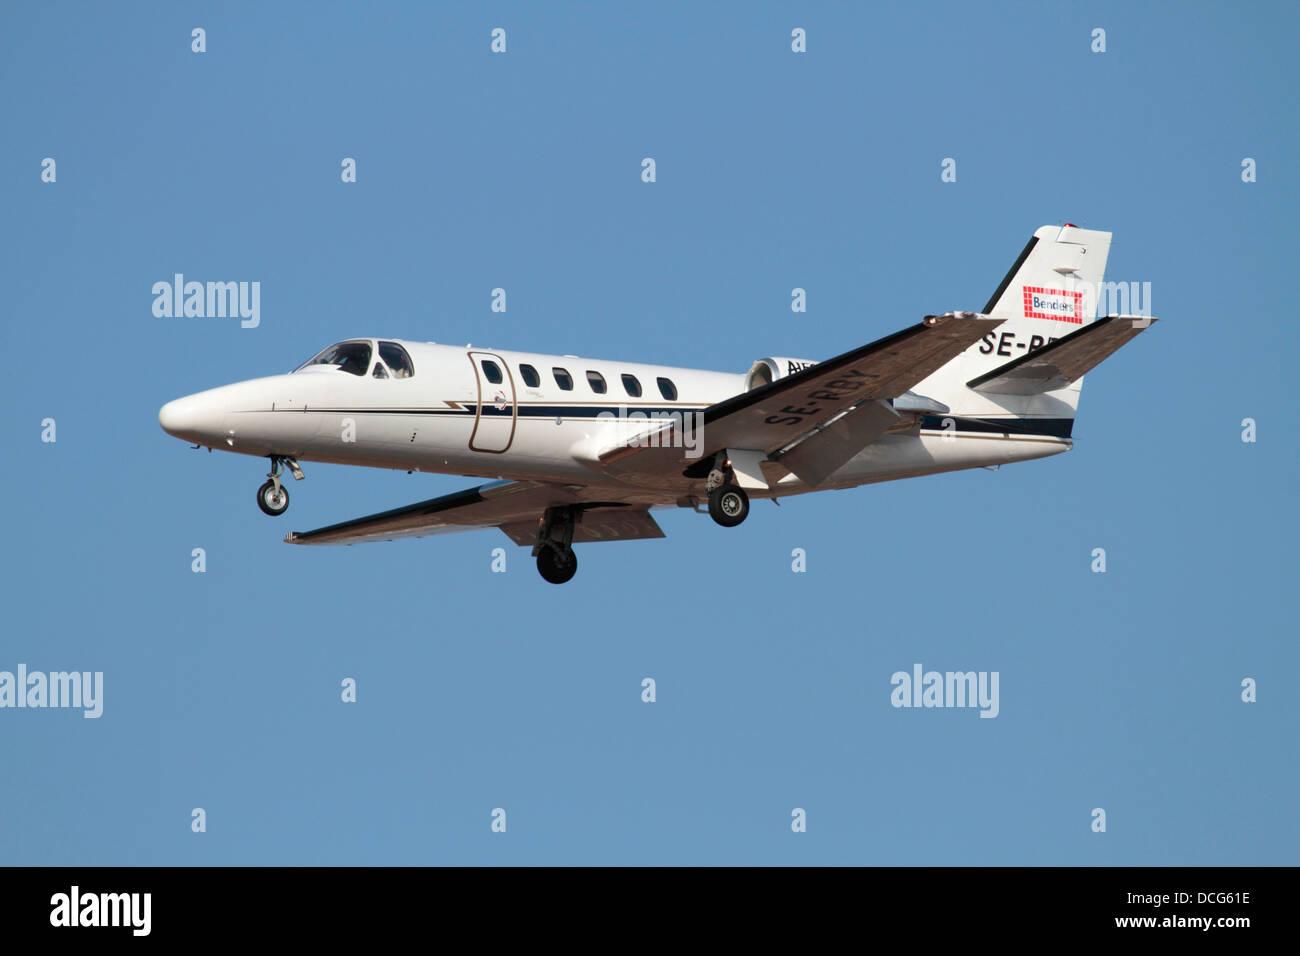 Cessna Citation Bravo business jet aircraft on approach - Stock Image